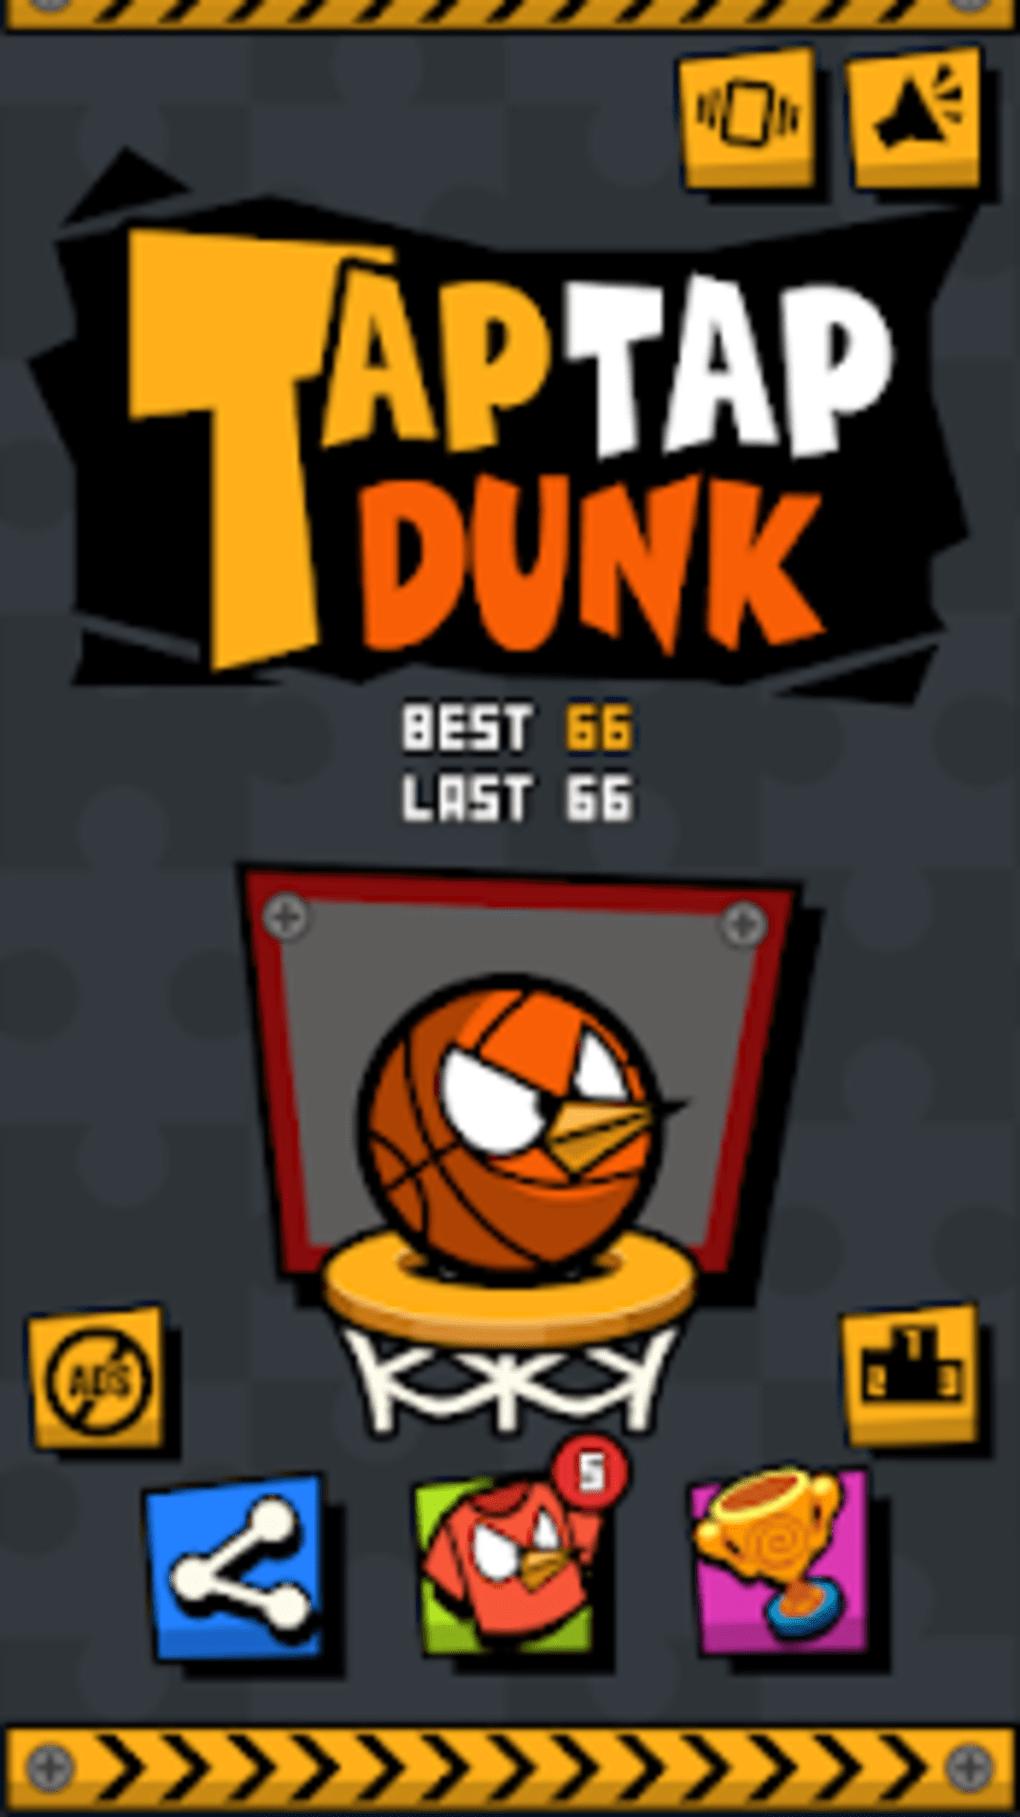 Tap Tap Dunk